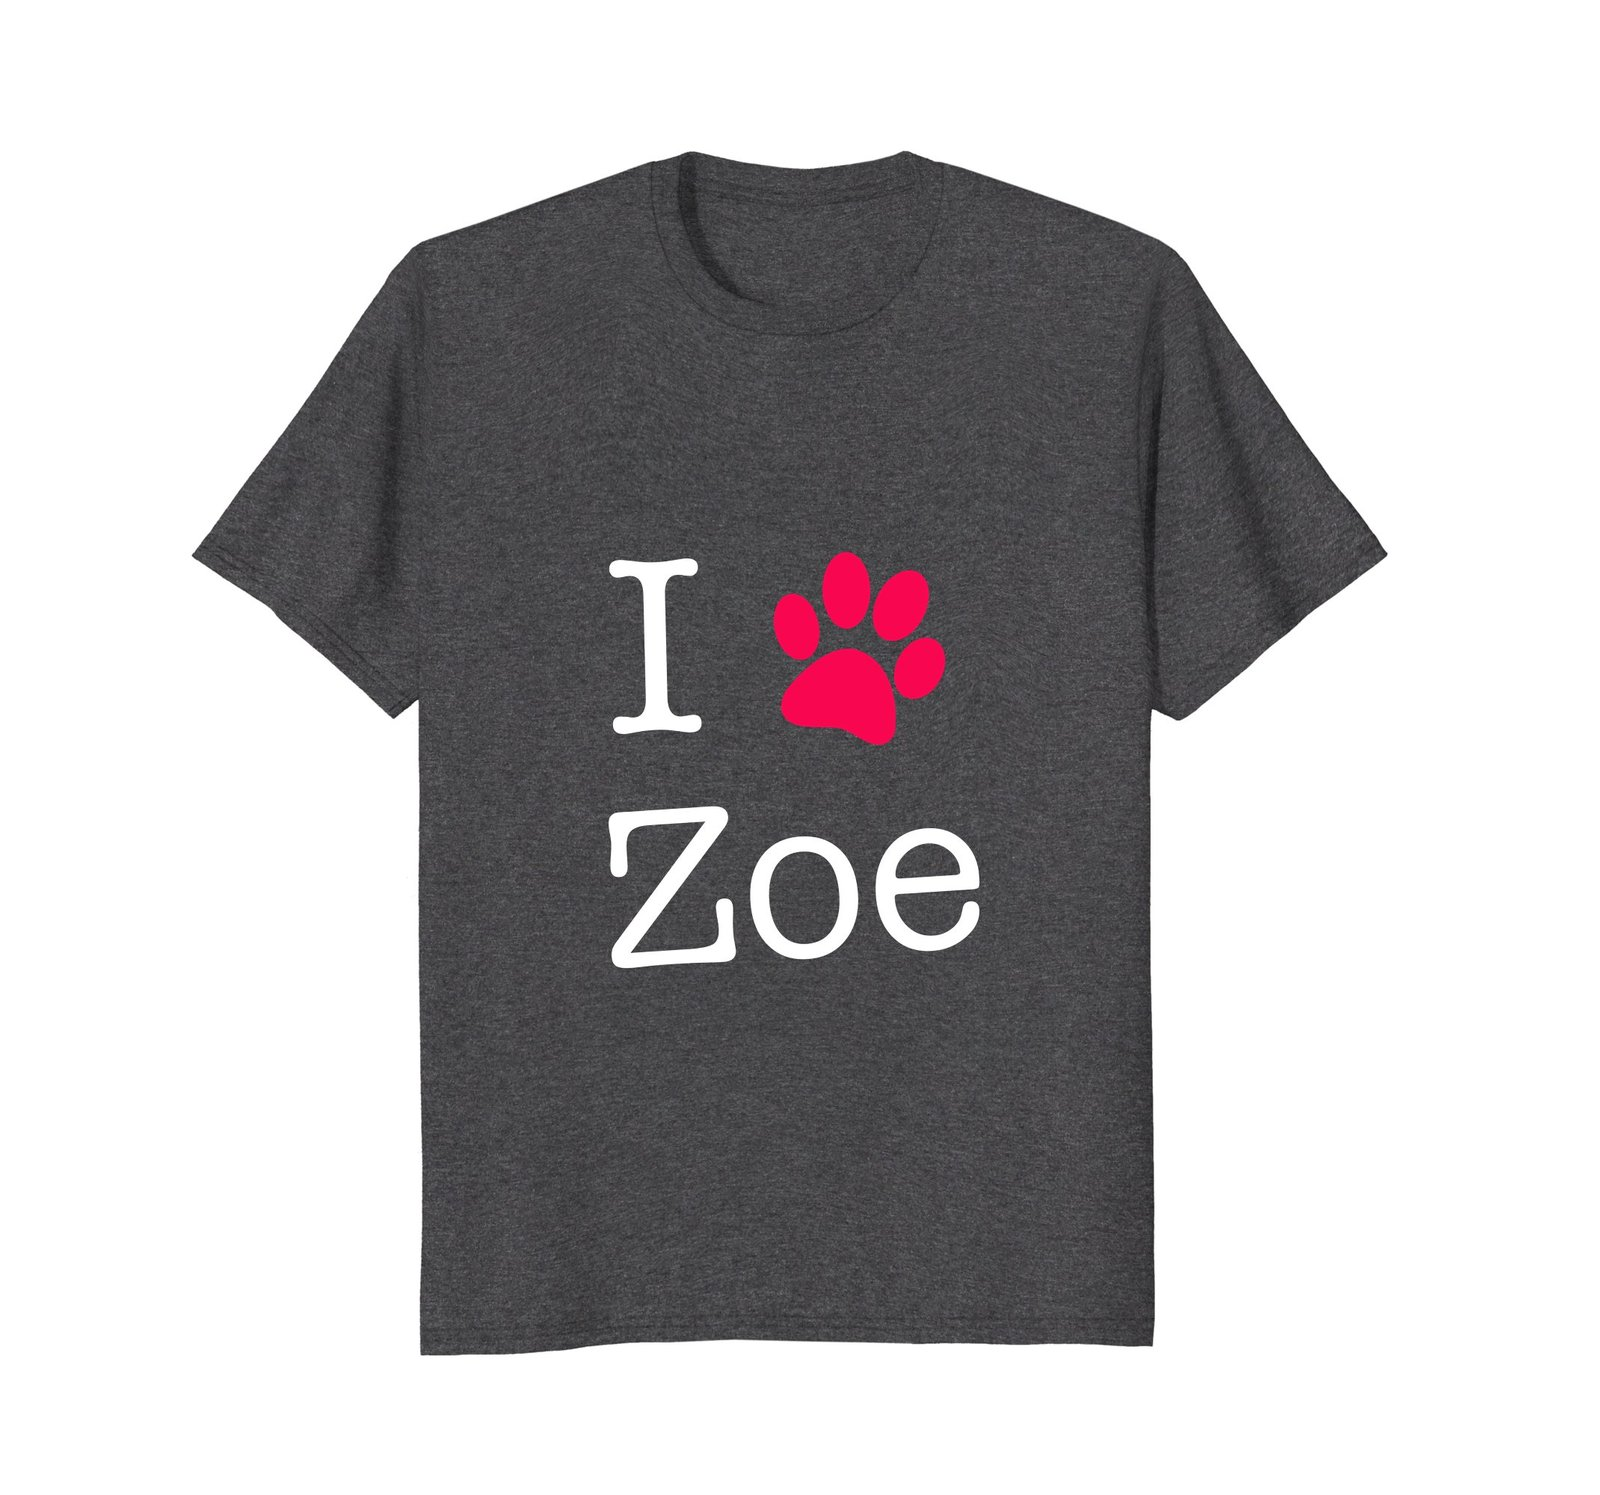 I Love Zoe Dog Name T-Shirt Gift Shirt For Dog Lovers